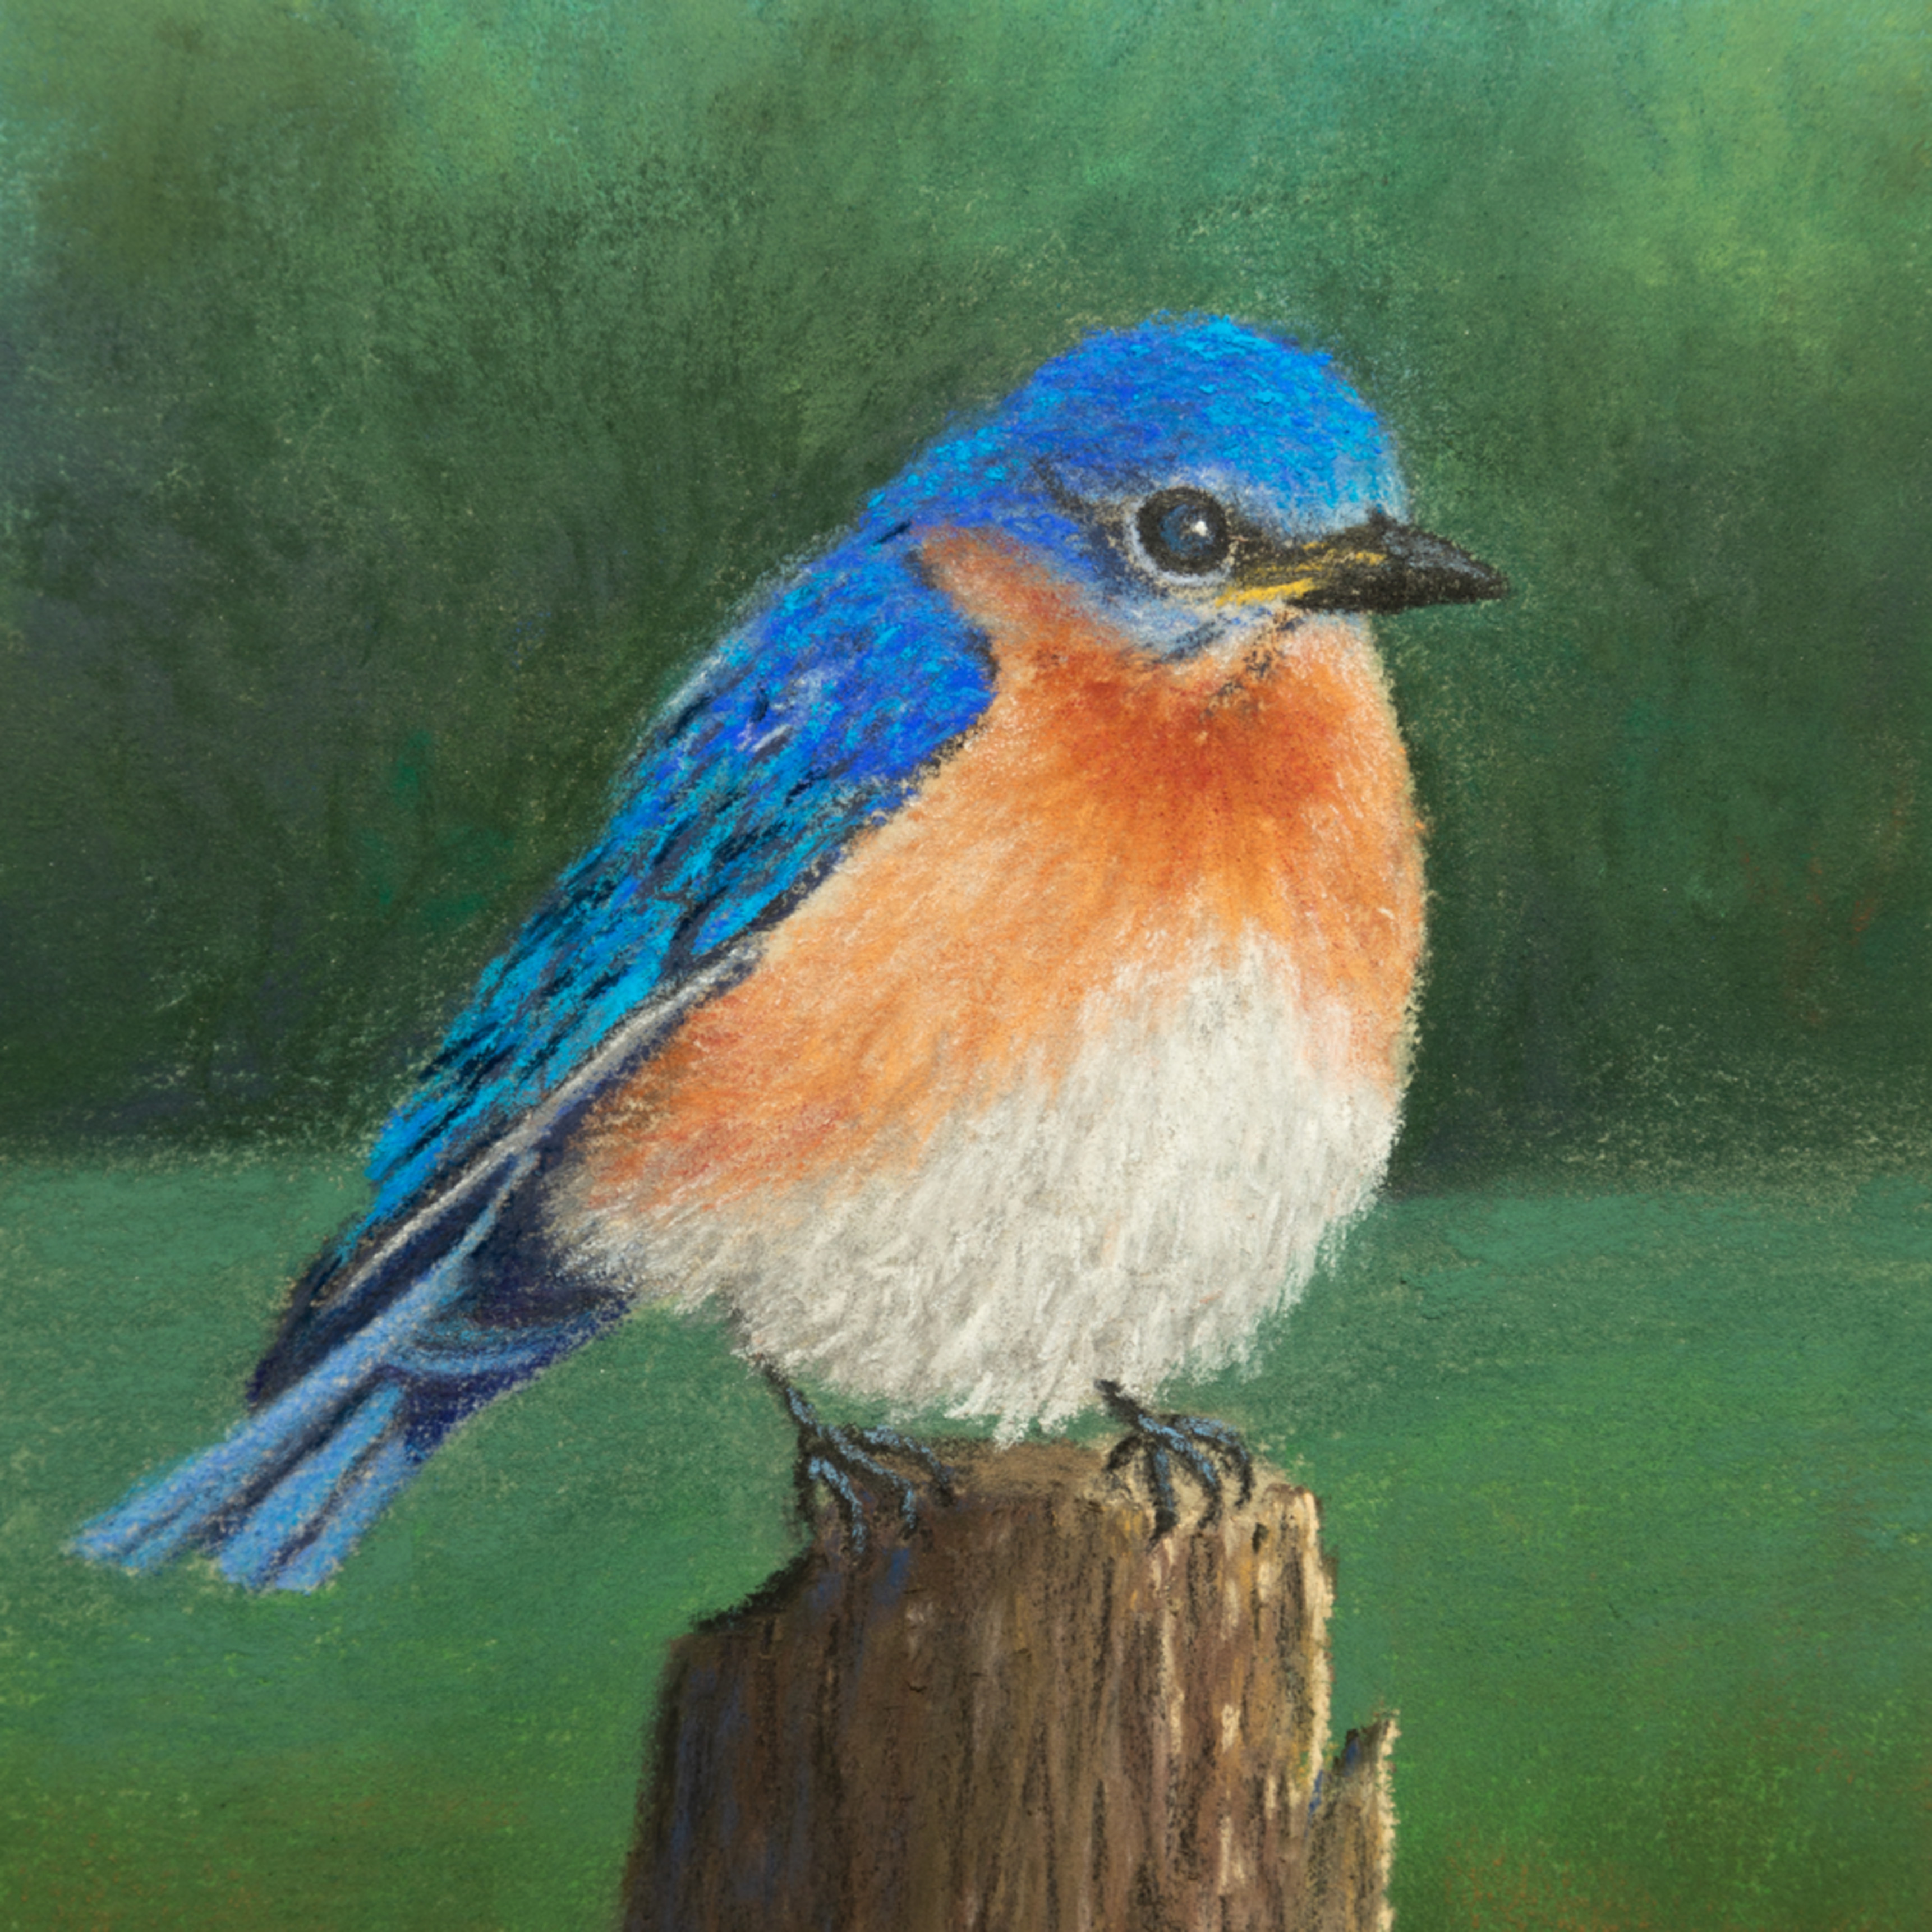 Bluebird resting jjnksf